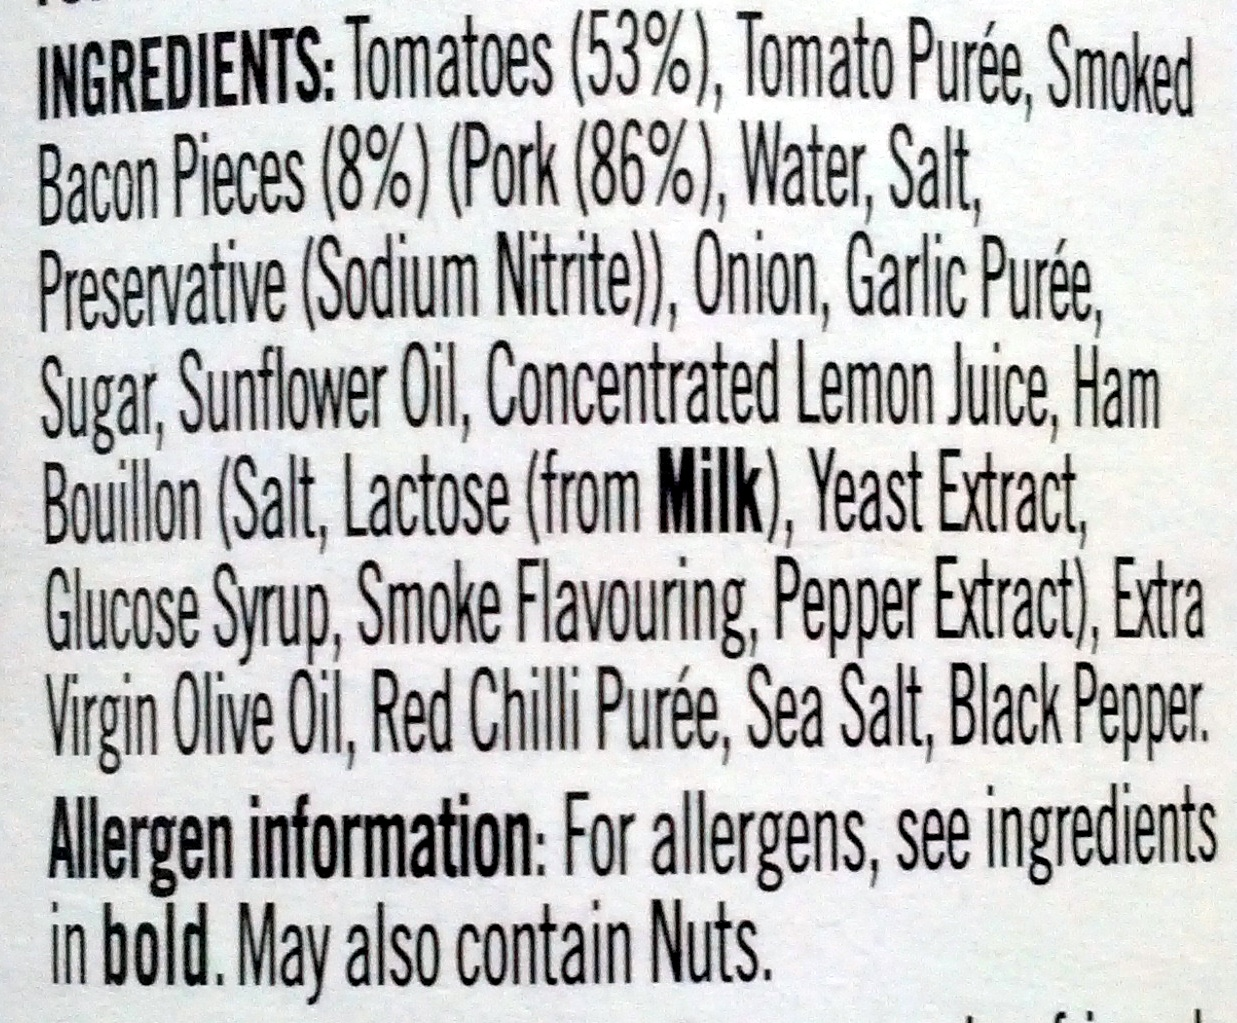 Tomato & Smoked Bacon Sauce - Ingredients